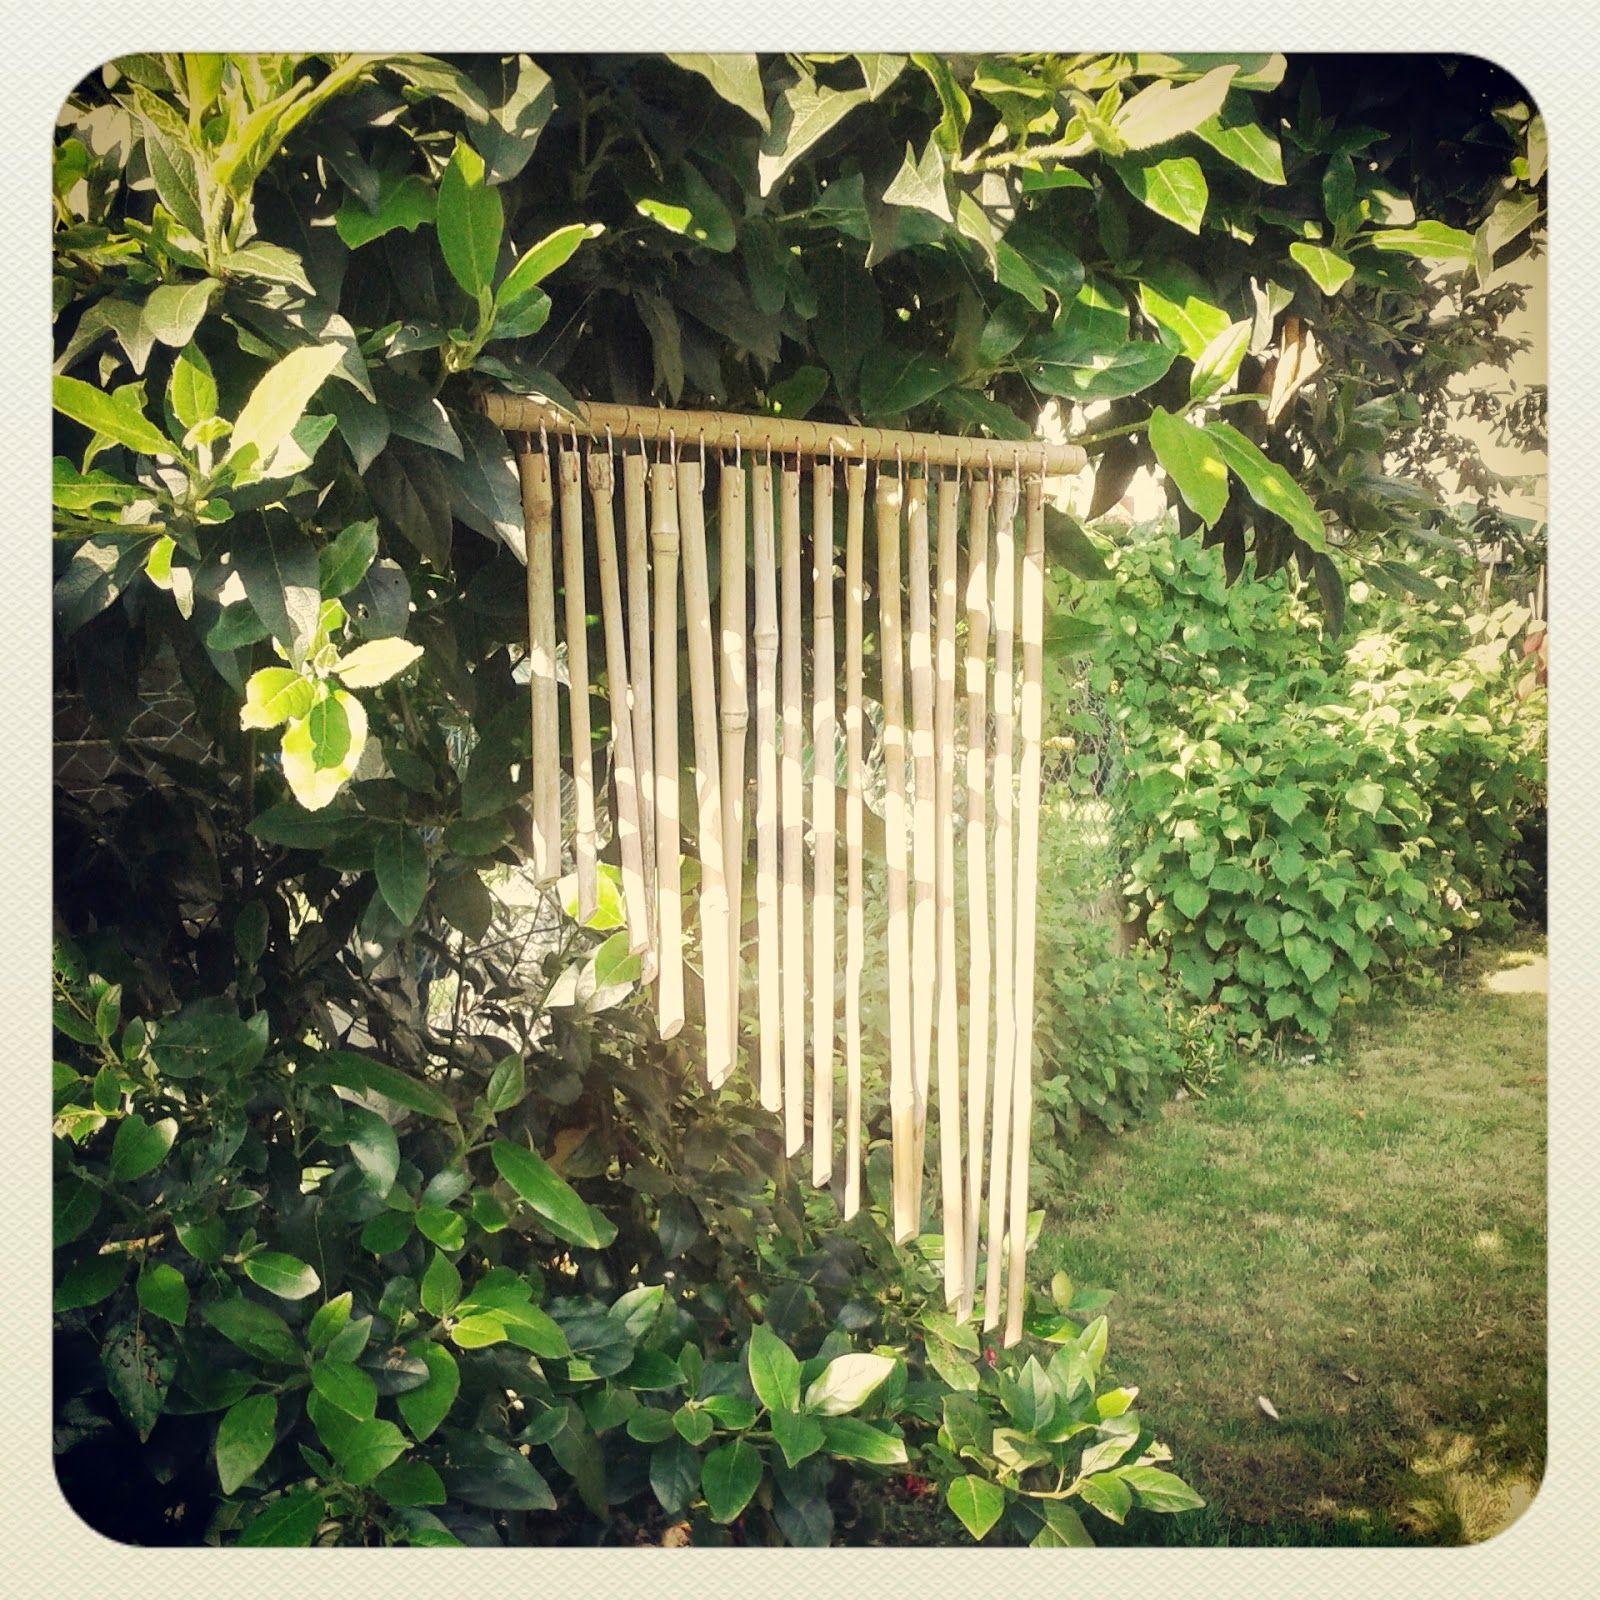 Carillon En Bambou | Idées Jardin, Bambou, Carillon Japonais pour Carillon Bambou Jardin